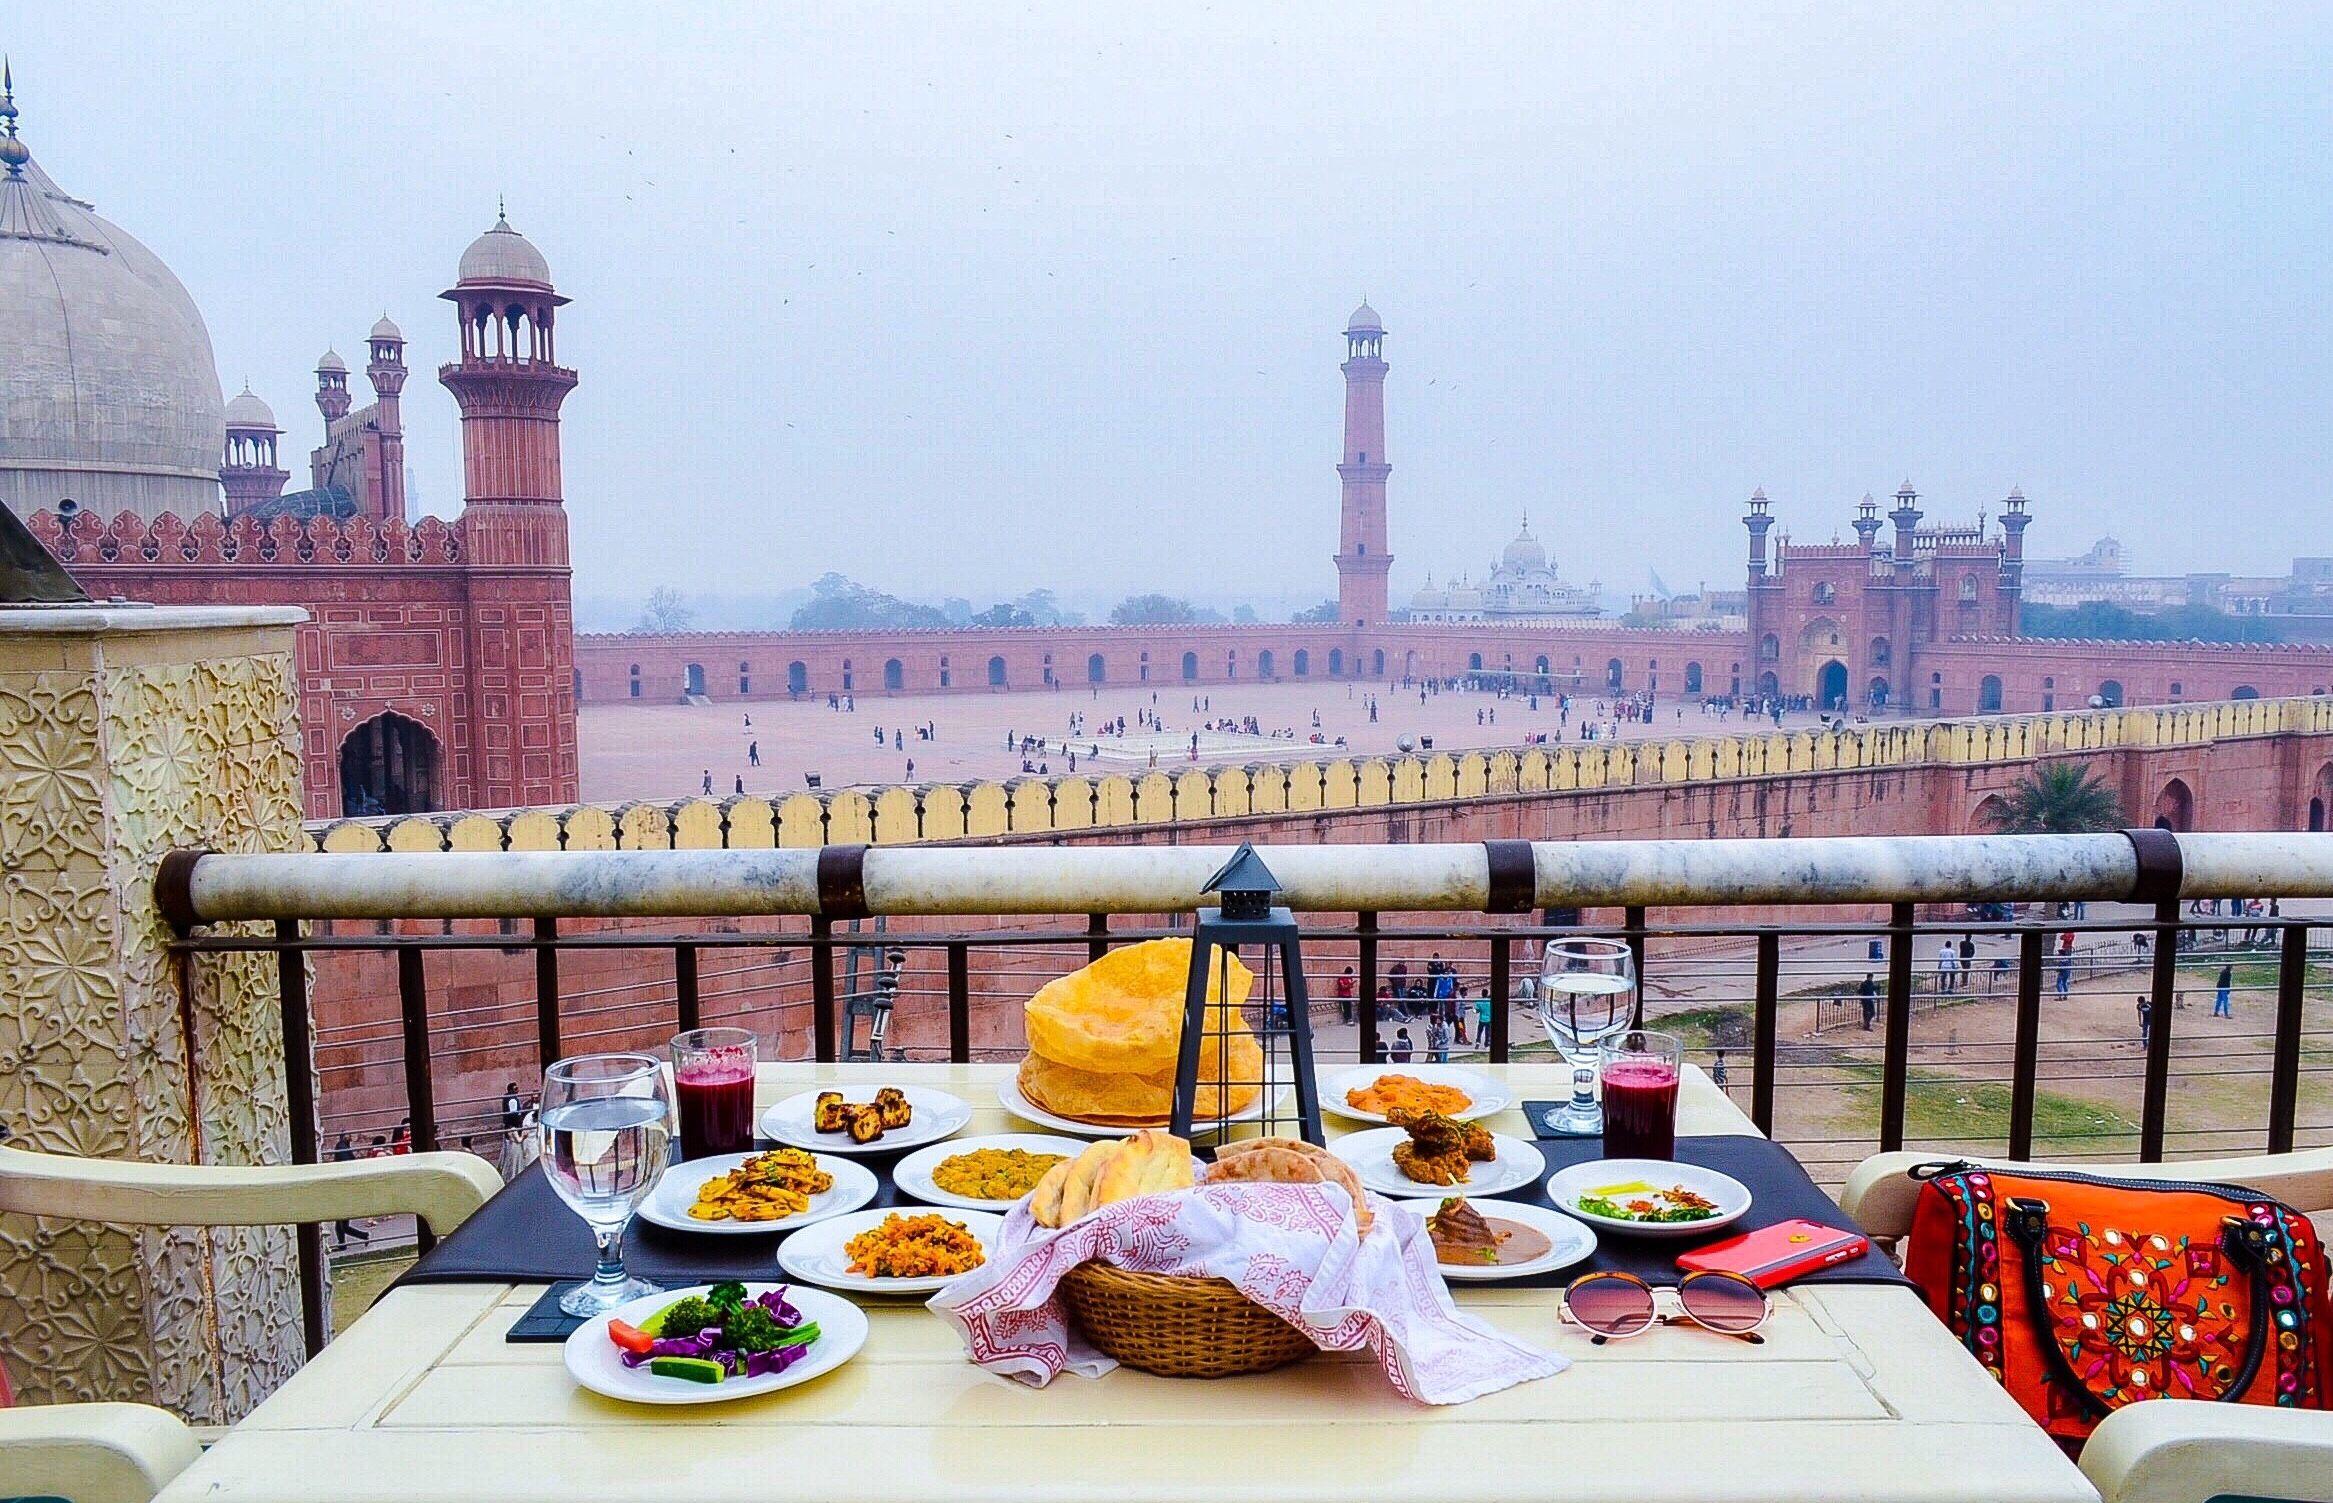 Pakistan Roof top Restaurant Ramadan